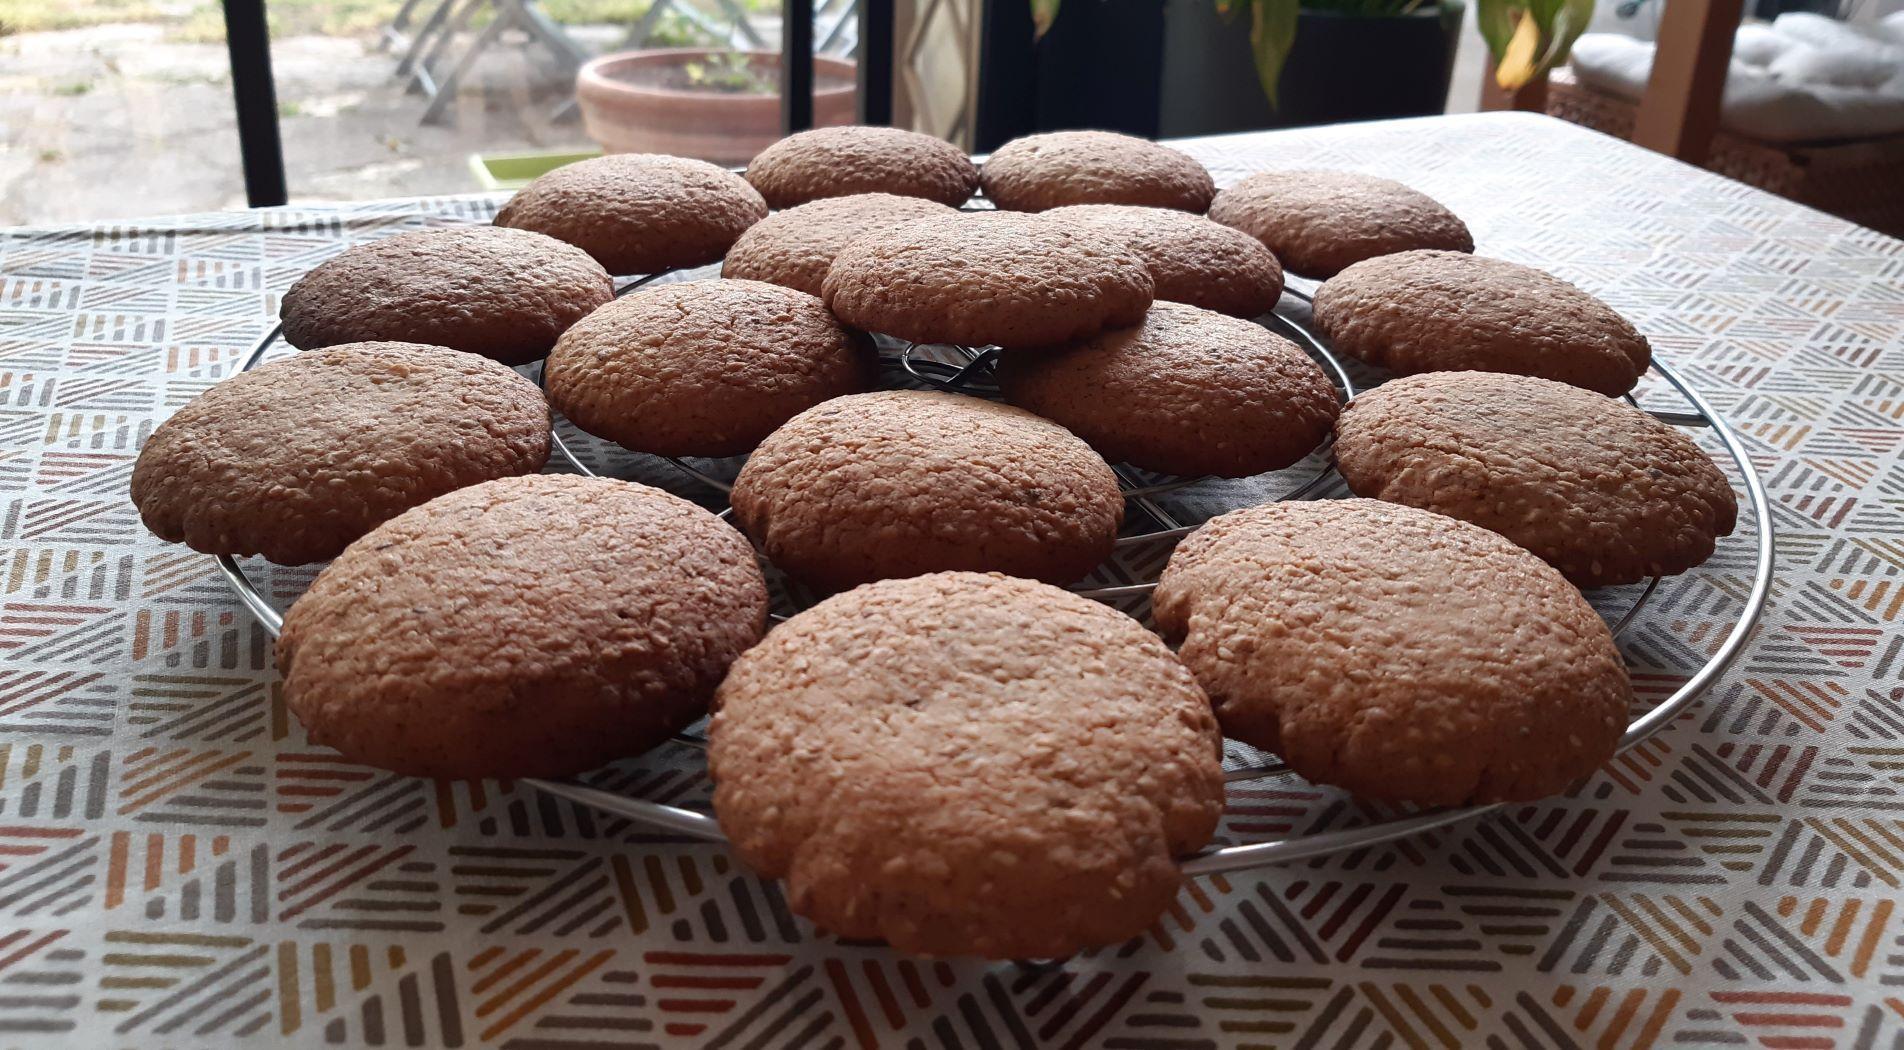 20210706 biscuits sesame 2